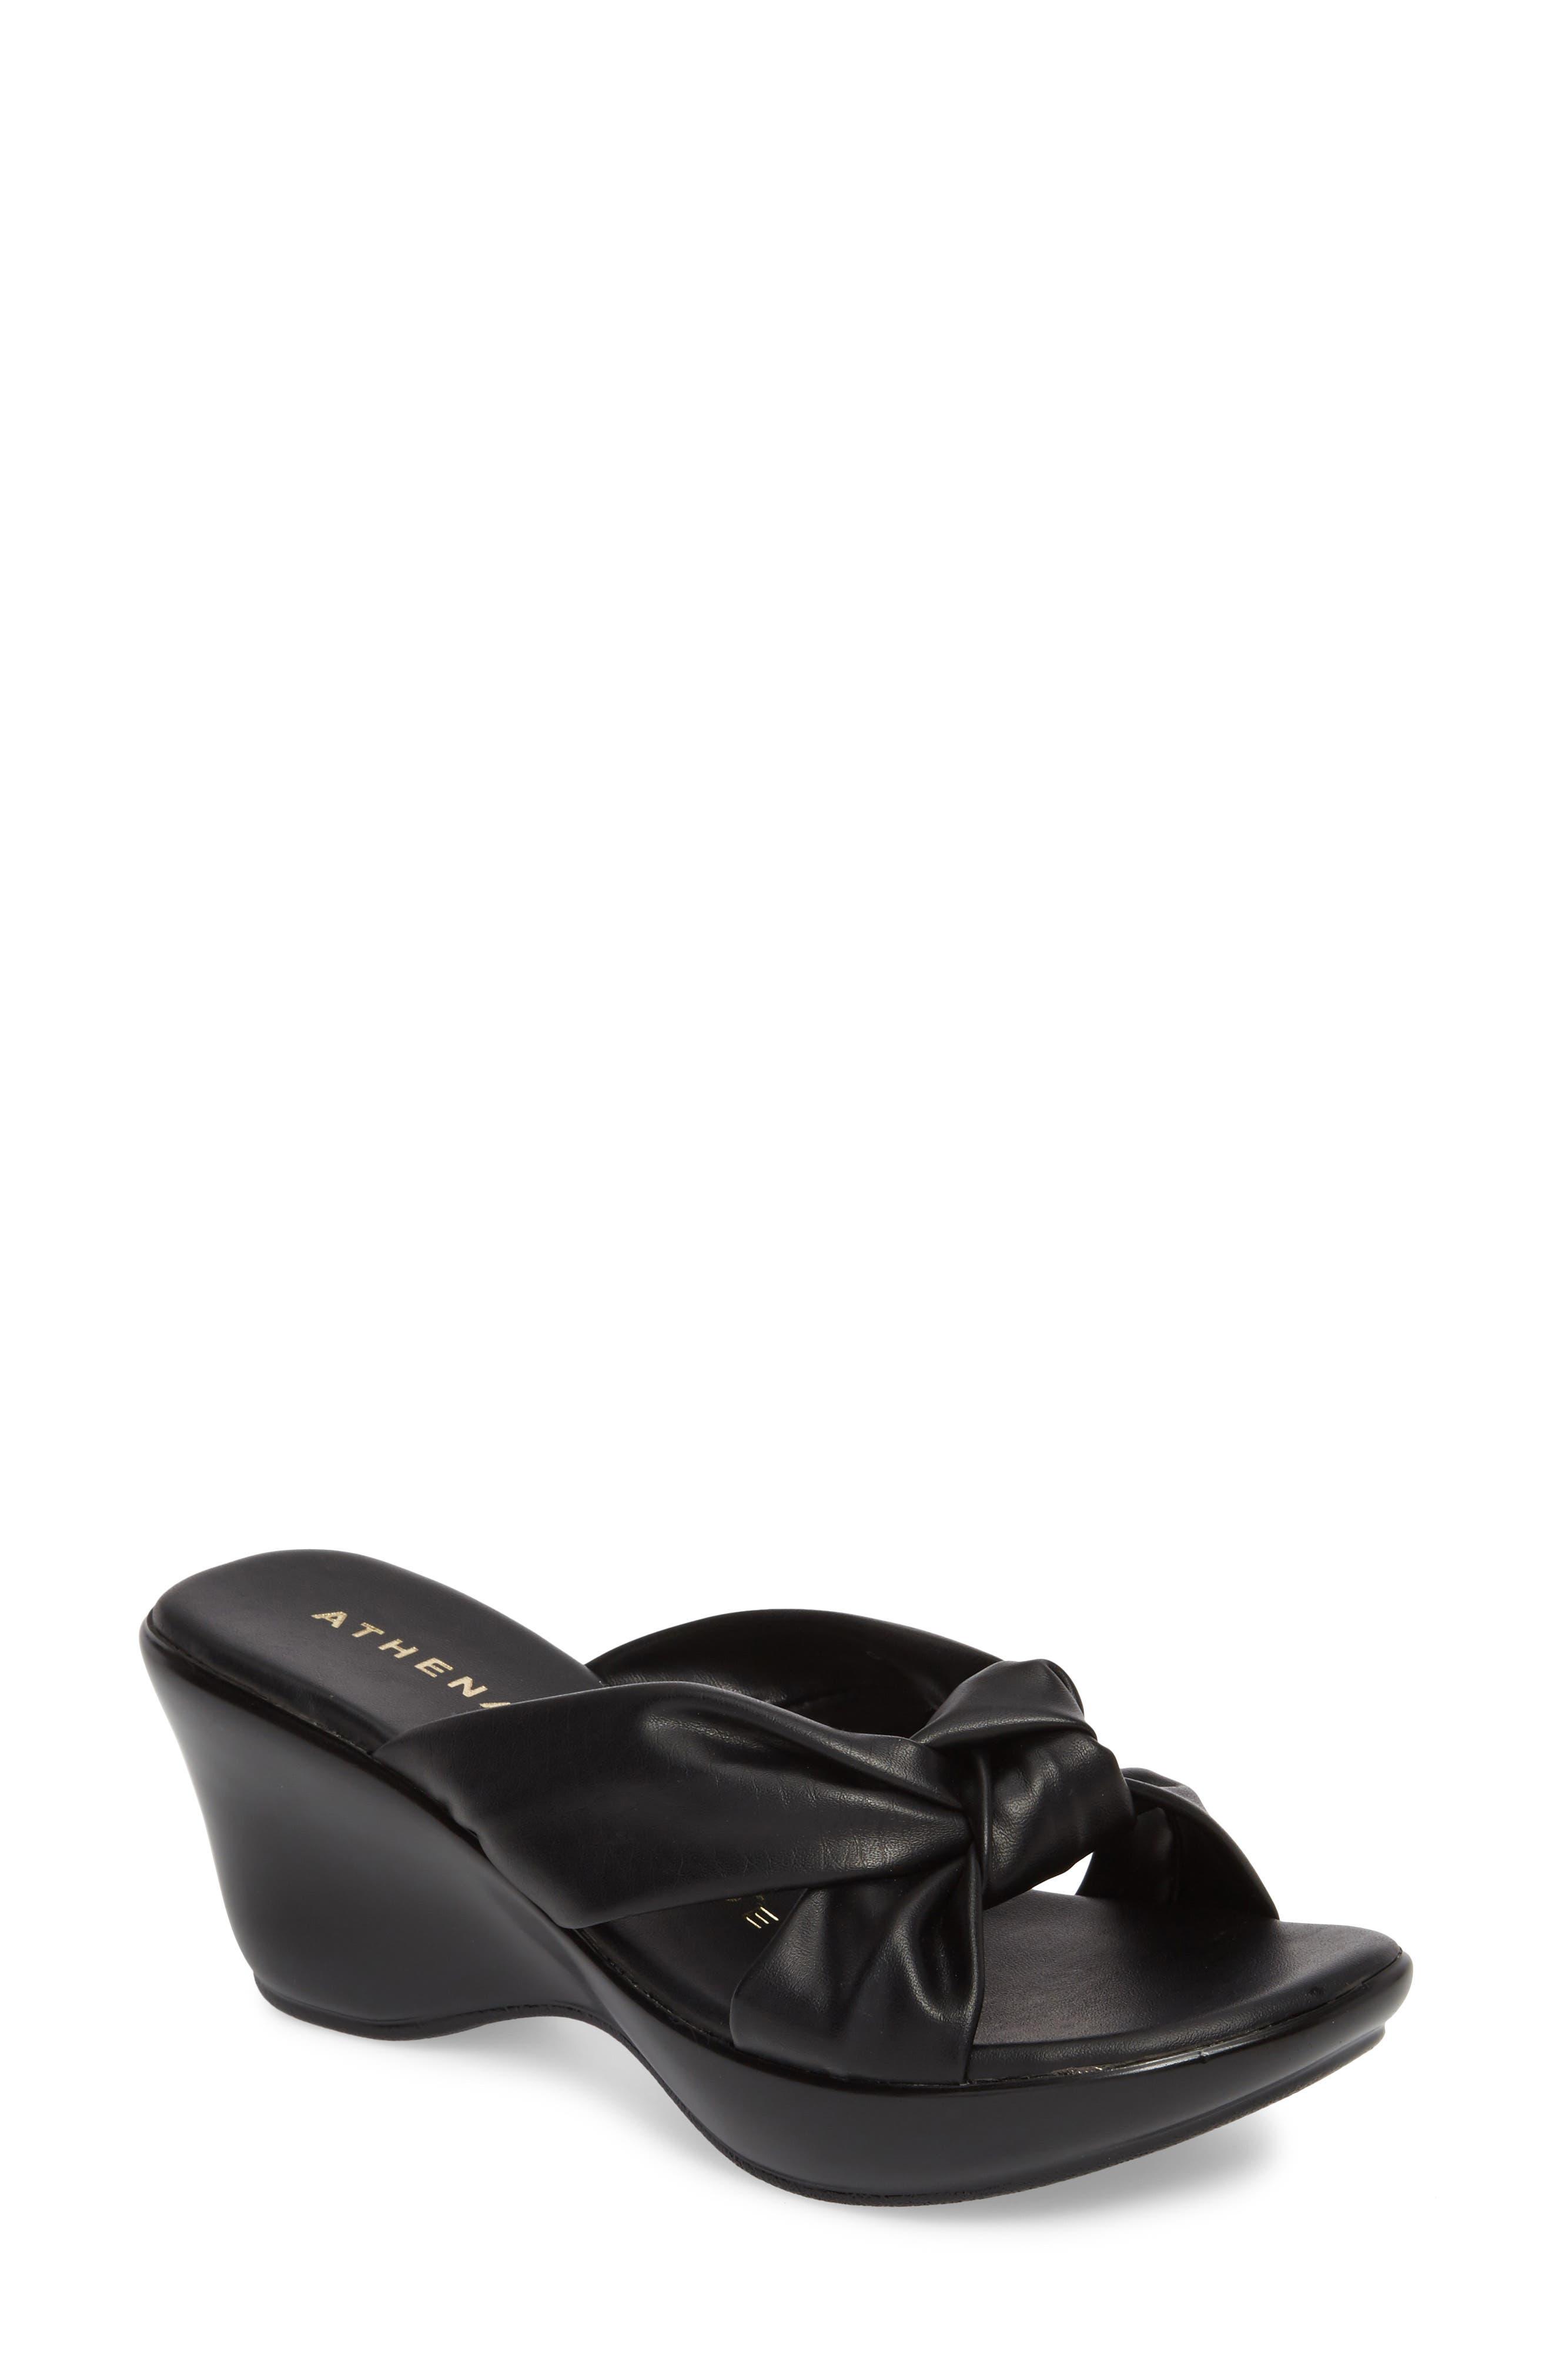 Soraya Wedge Sandal,                         Main,                         color, BLACK FABRIC